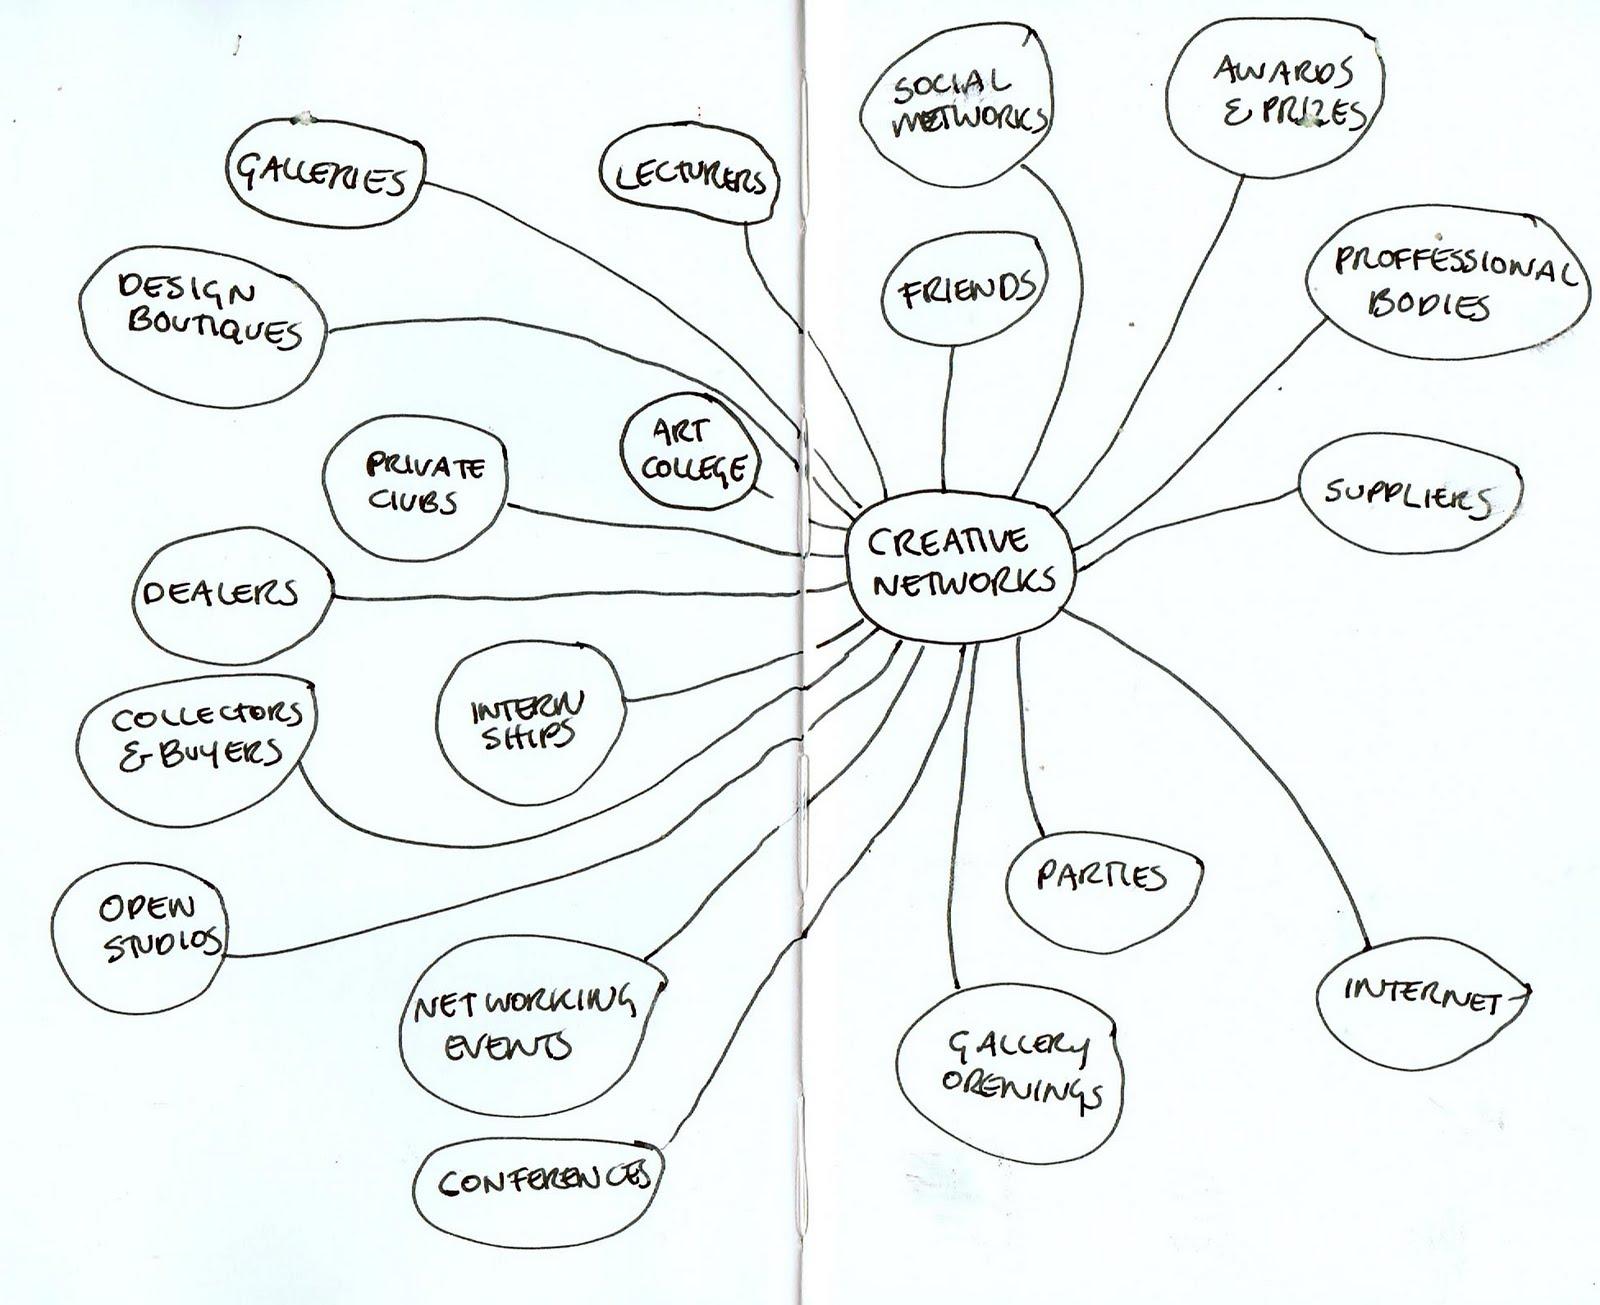 Workbook Helen Reynolds Creative Networks